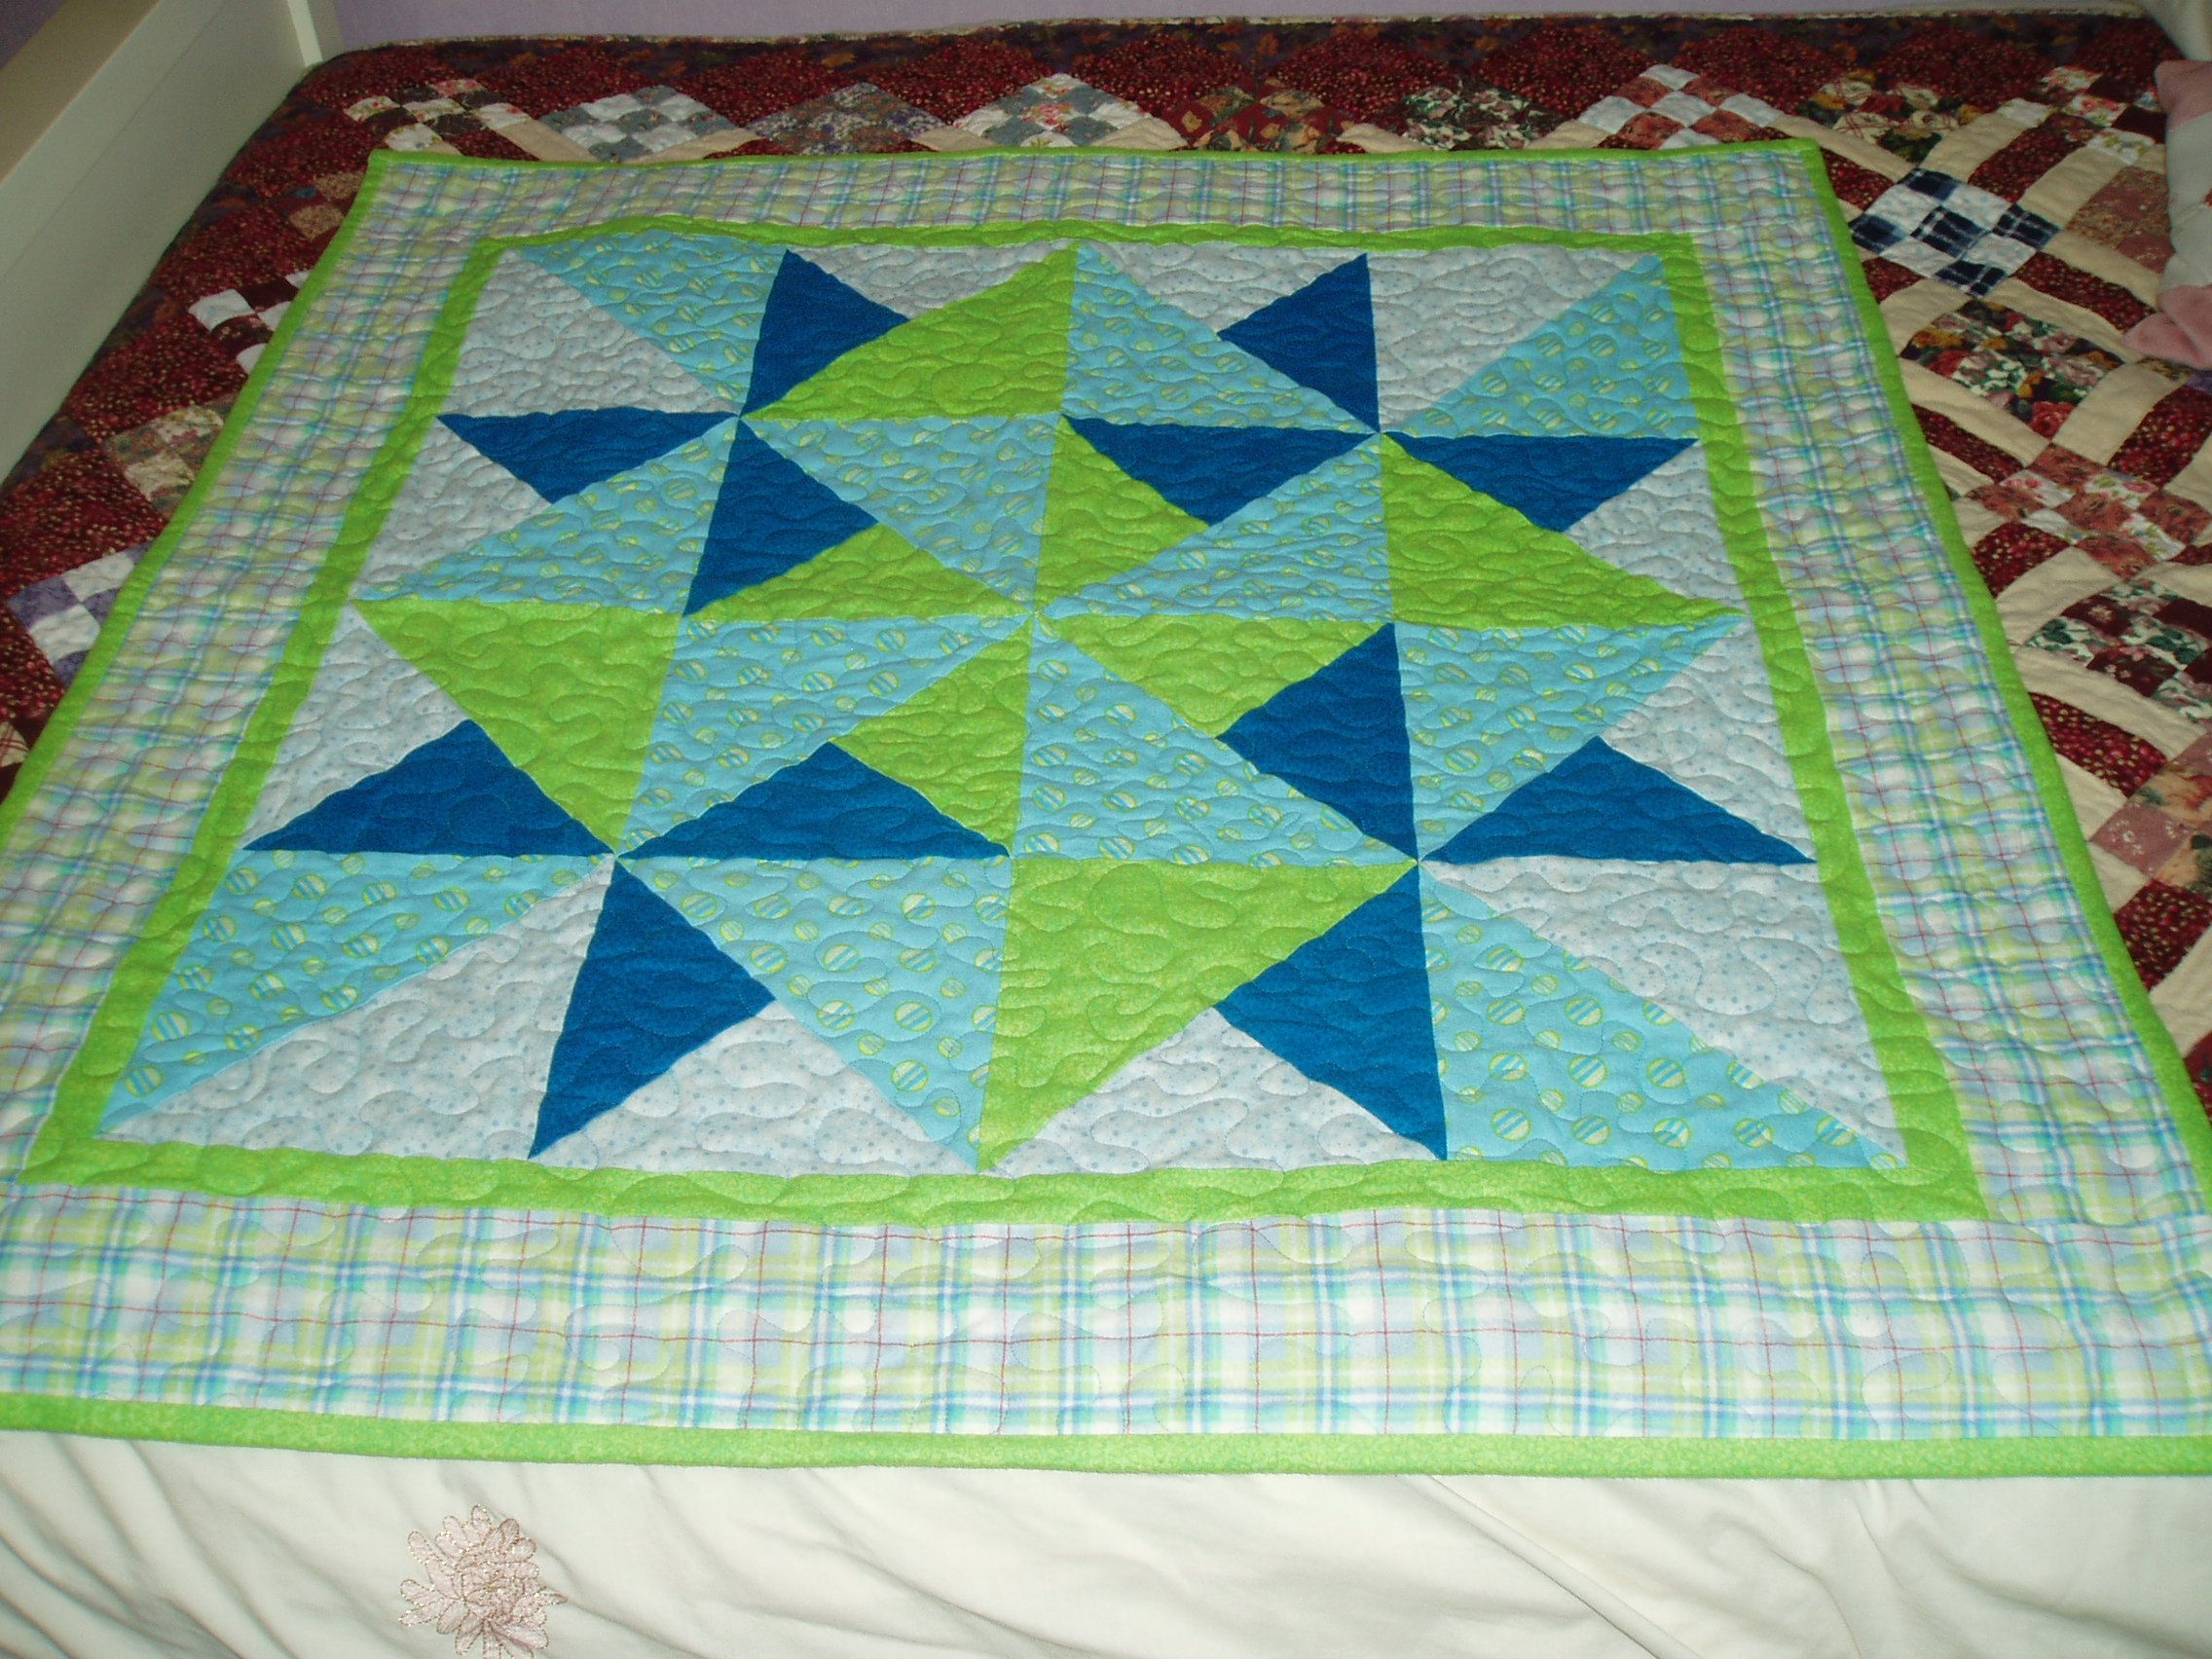 Quilt Patterns For Flannel : Flannel baby quilt - magazine pattern quilting ideas Pinterest